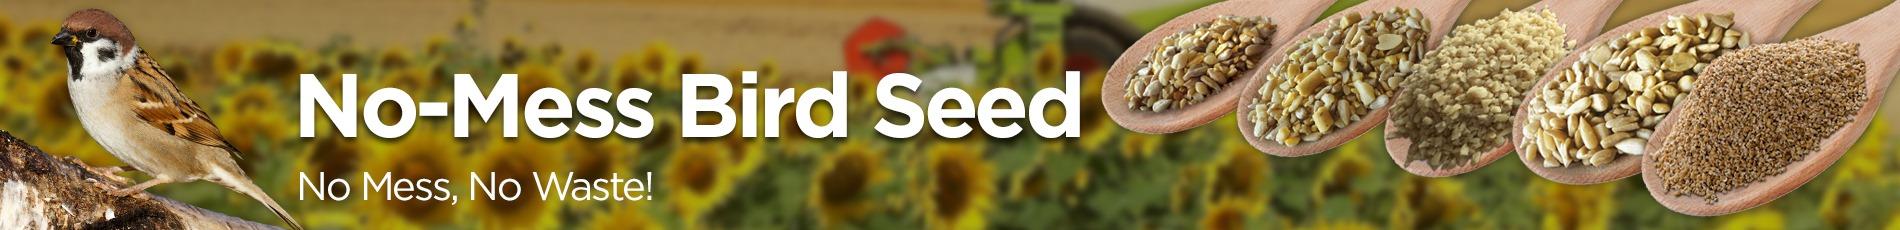 No-Mess Bird Seed